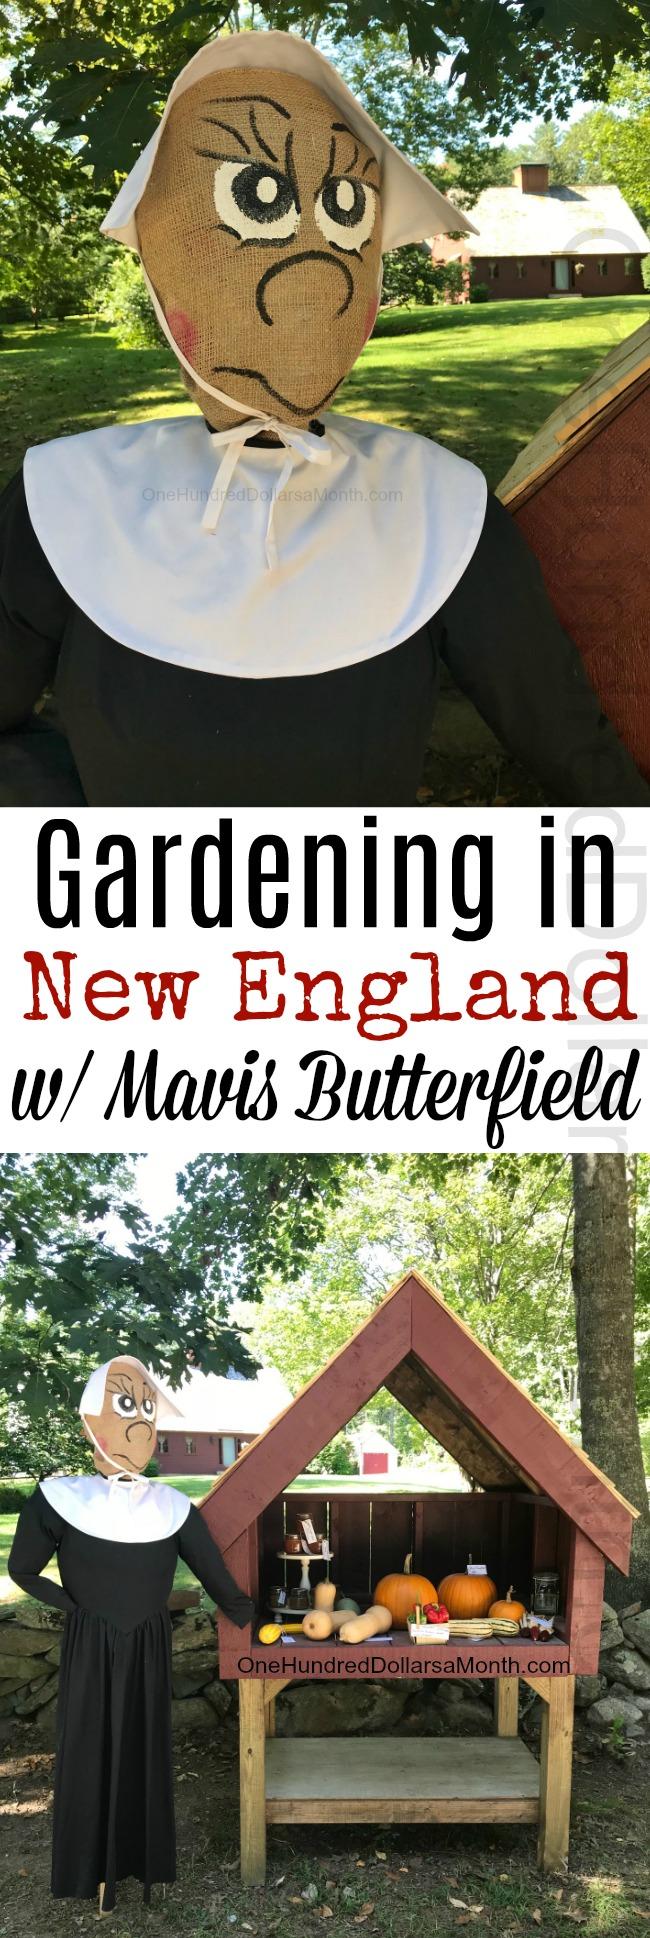 Gardening in New England – New Garden Stand Photos and a Garden Tally Update!